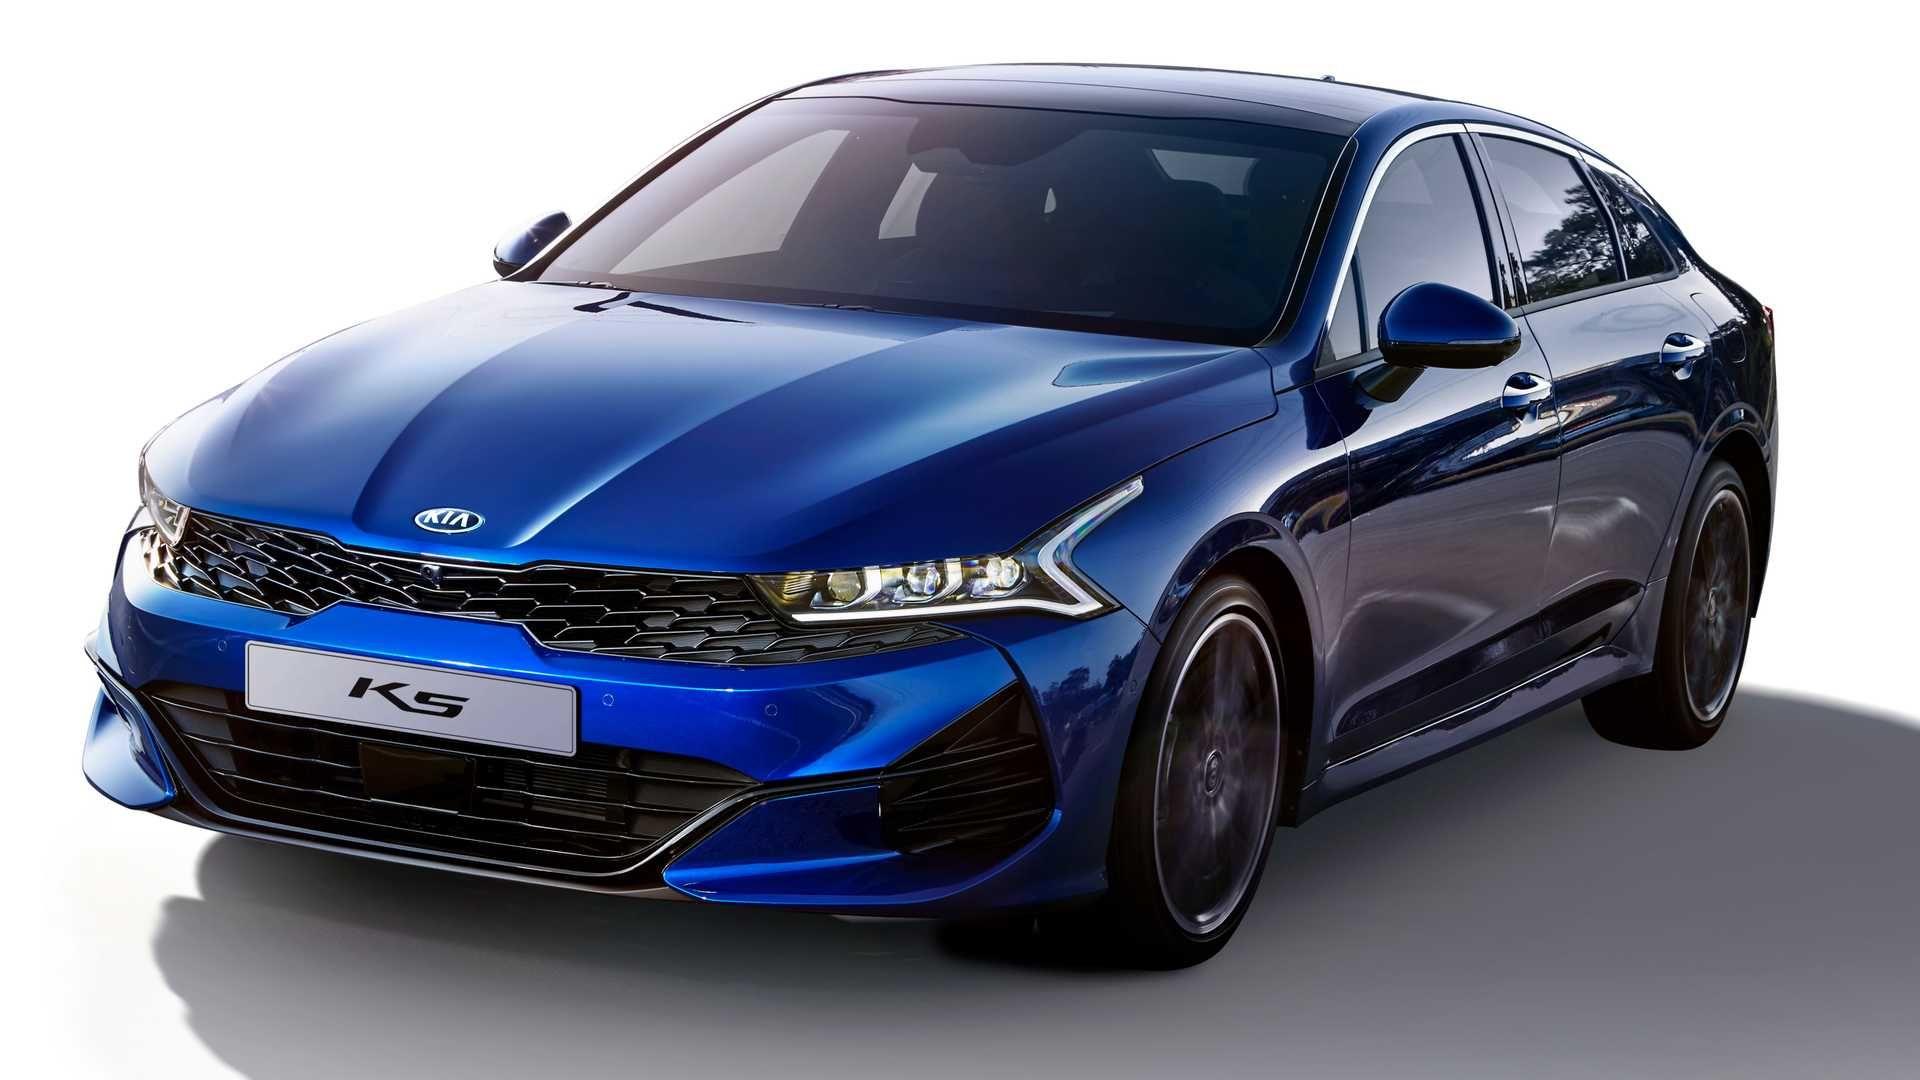 Car Industry Latest News Updates Autodeals Pk In 2020 Kia Optima Kia Kia Optima K5